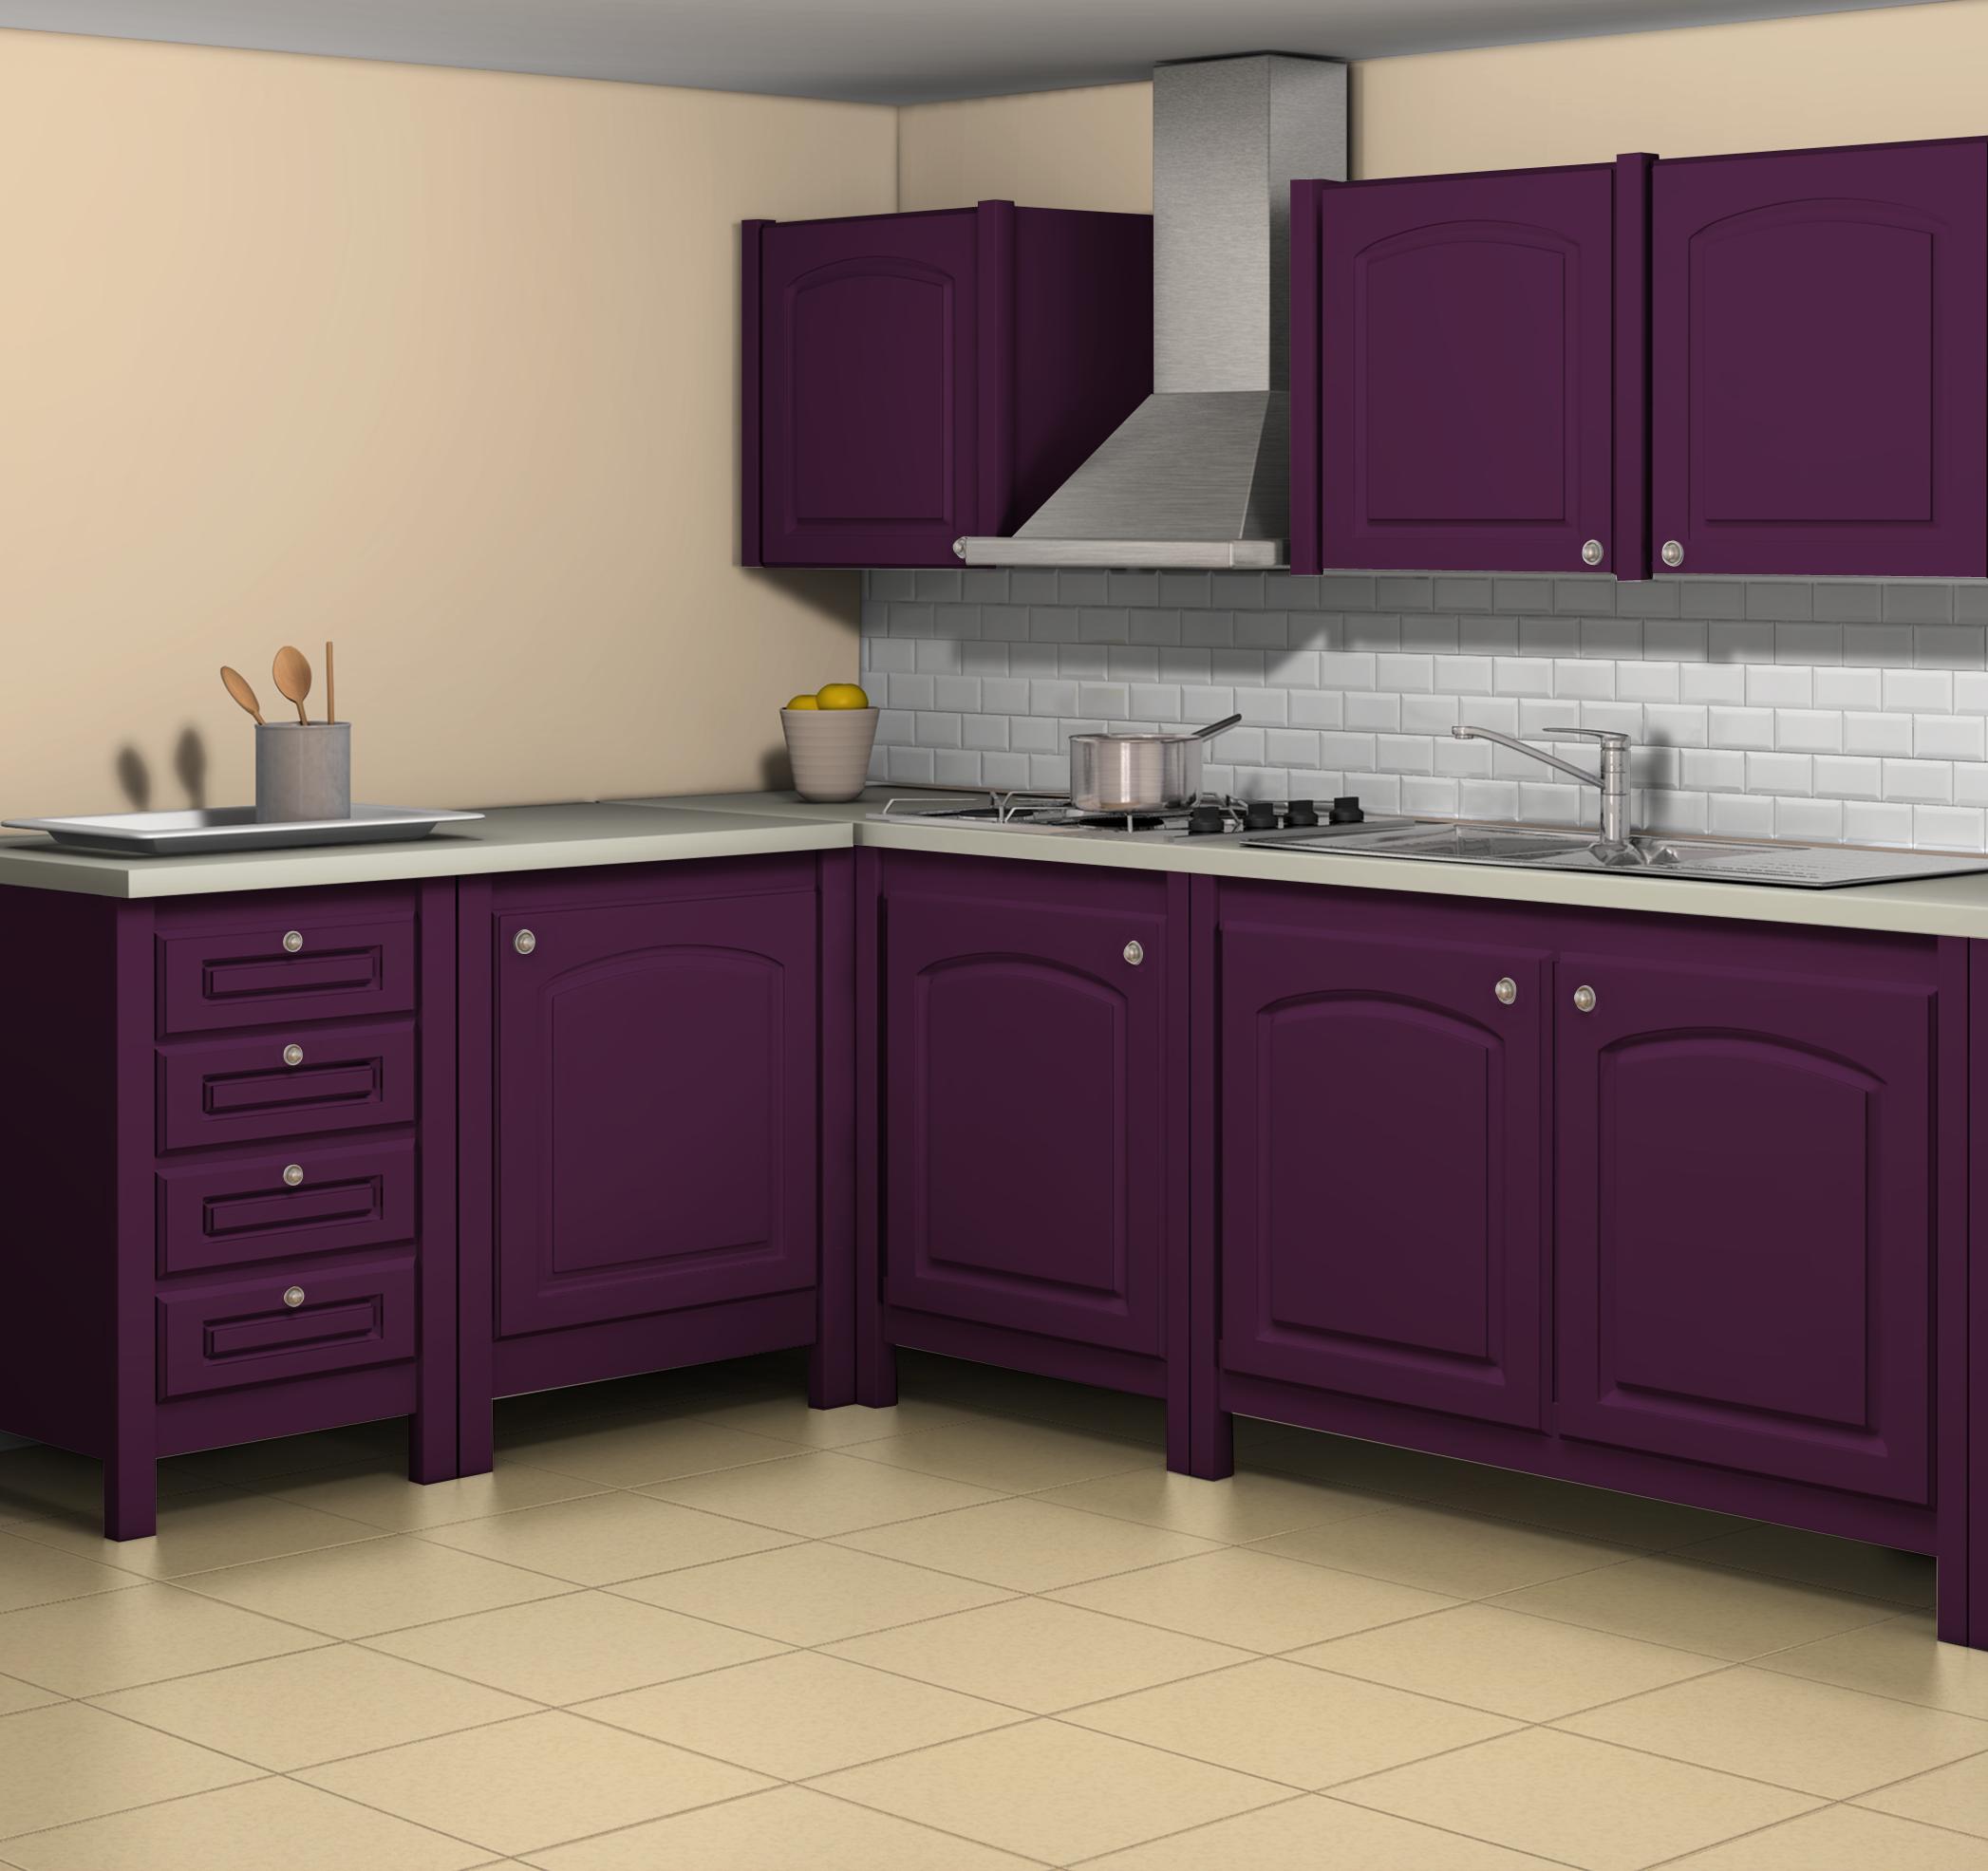 esprit campagne simulation avec la teinte aubergine fa ades meubles la teinte cr me de. Black Bedroom Furniture Sets. Home Design Ideas